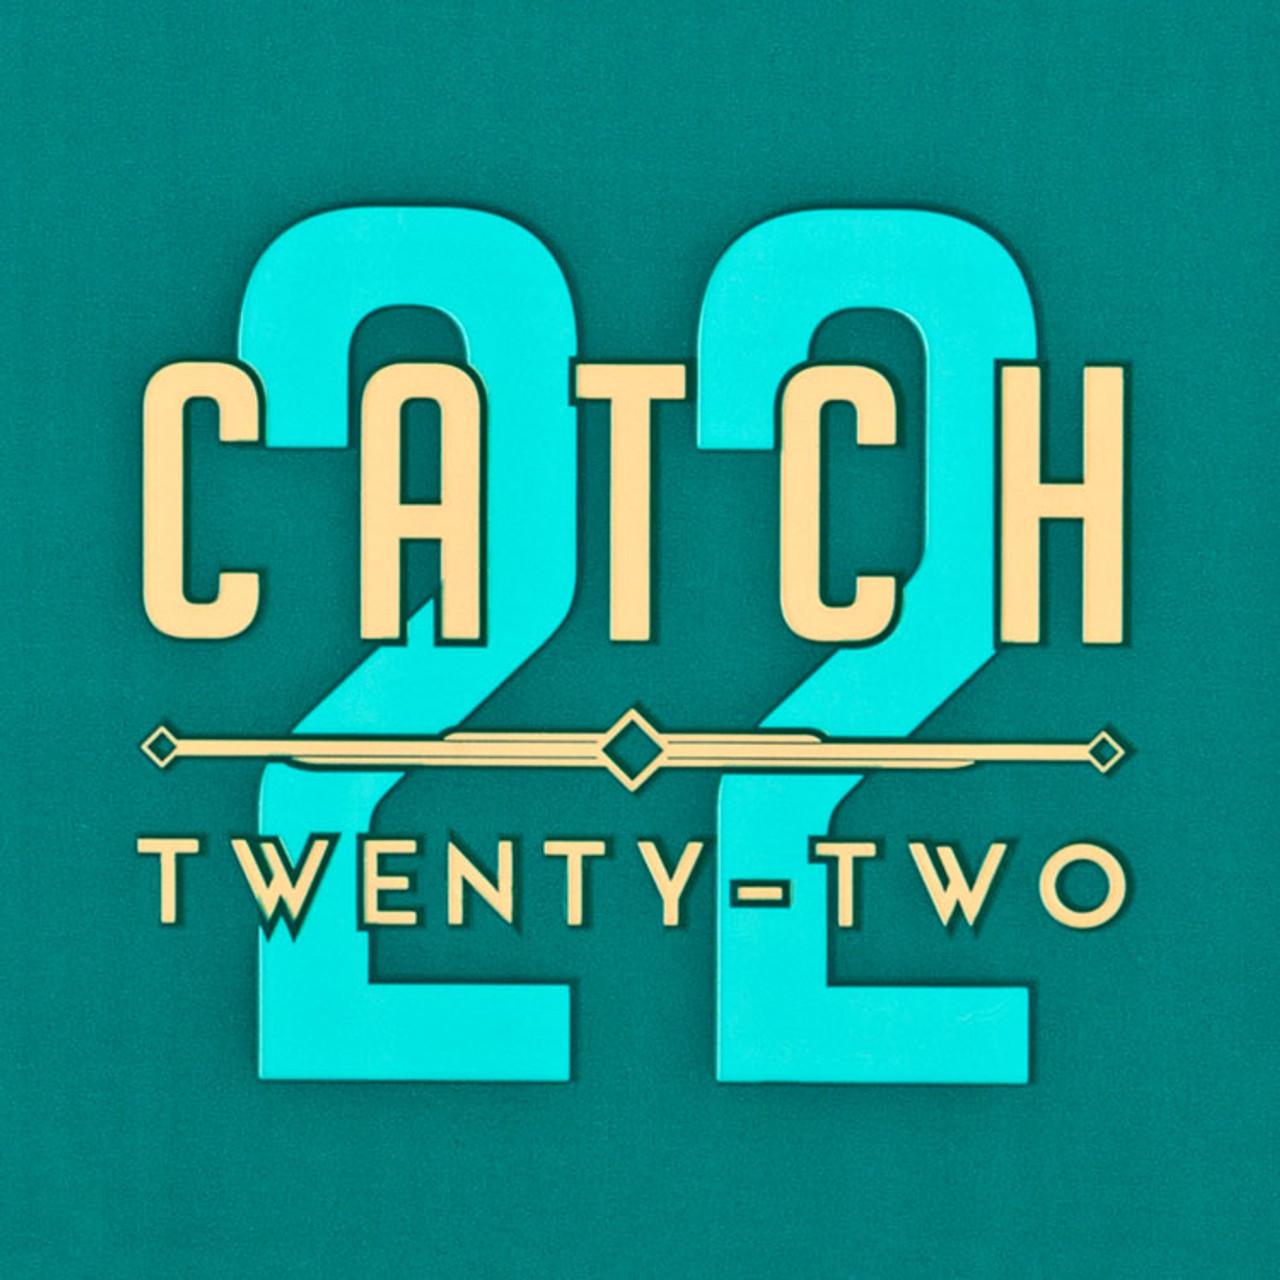 Rocky Patel Catch 22 Connecticut Toro Cigars - 6 x 52 (Box of 22)